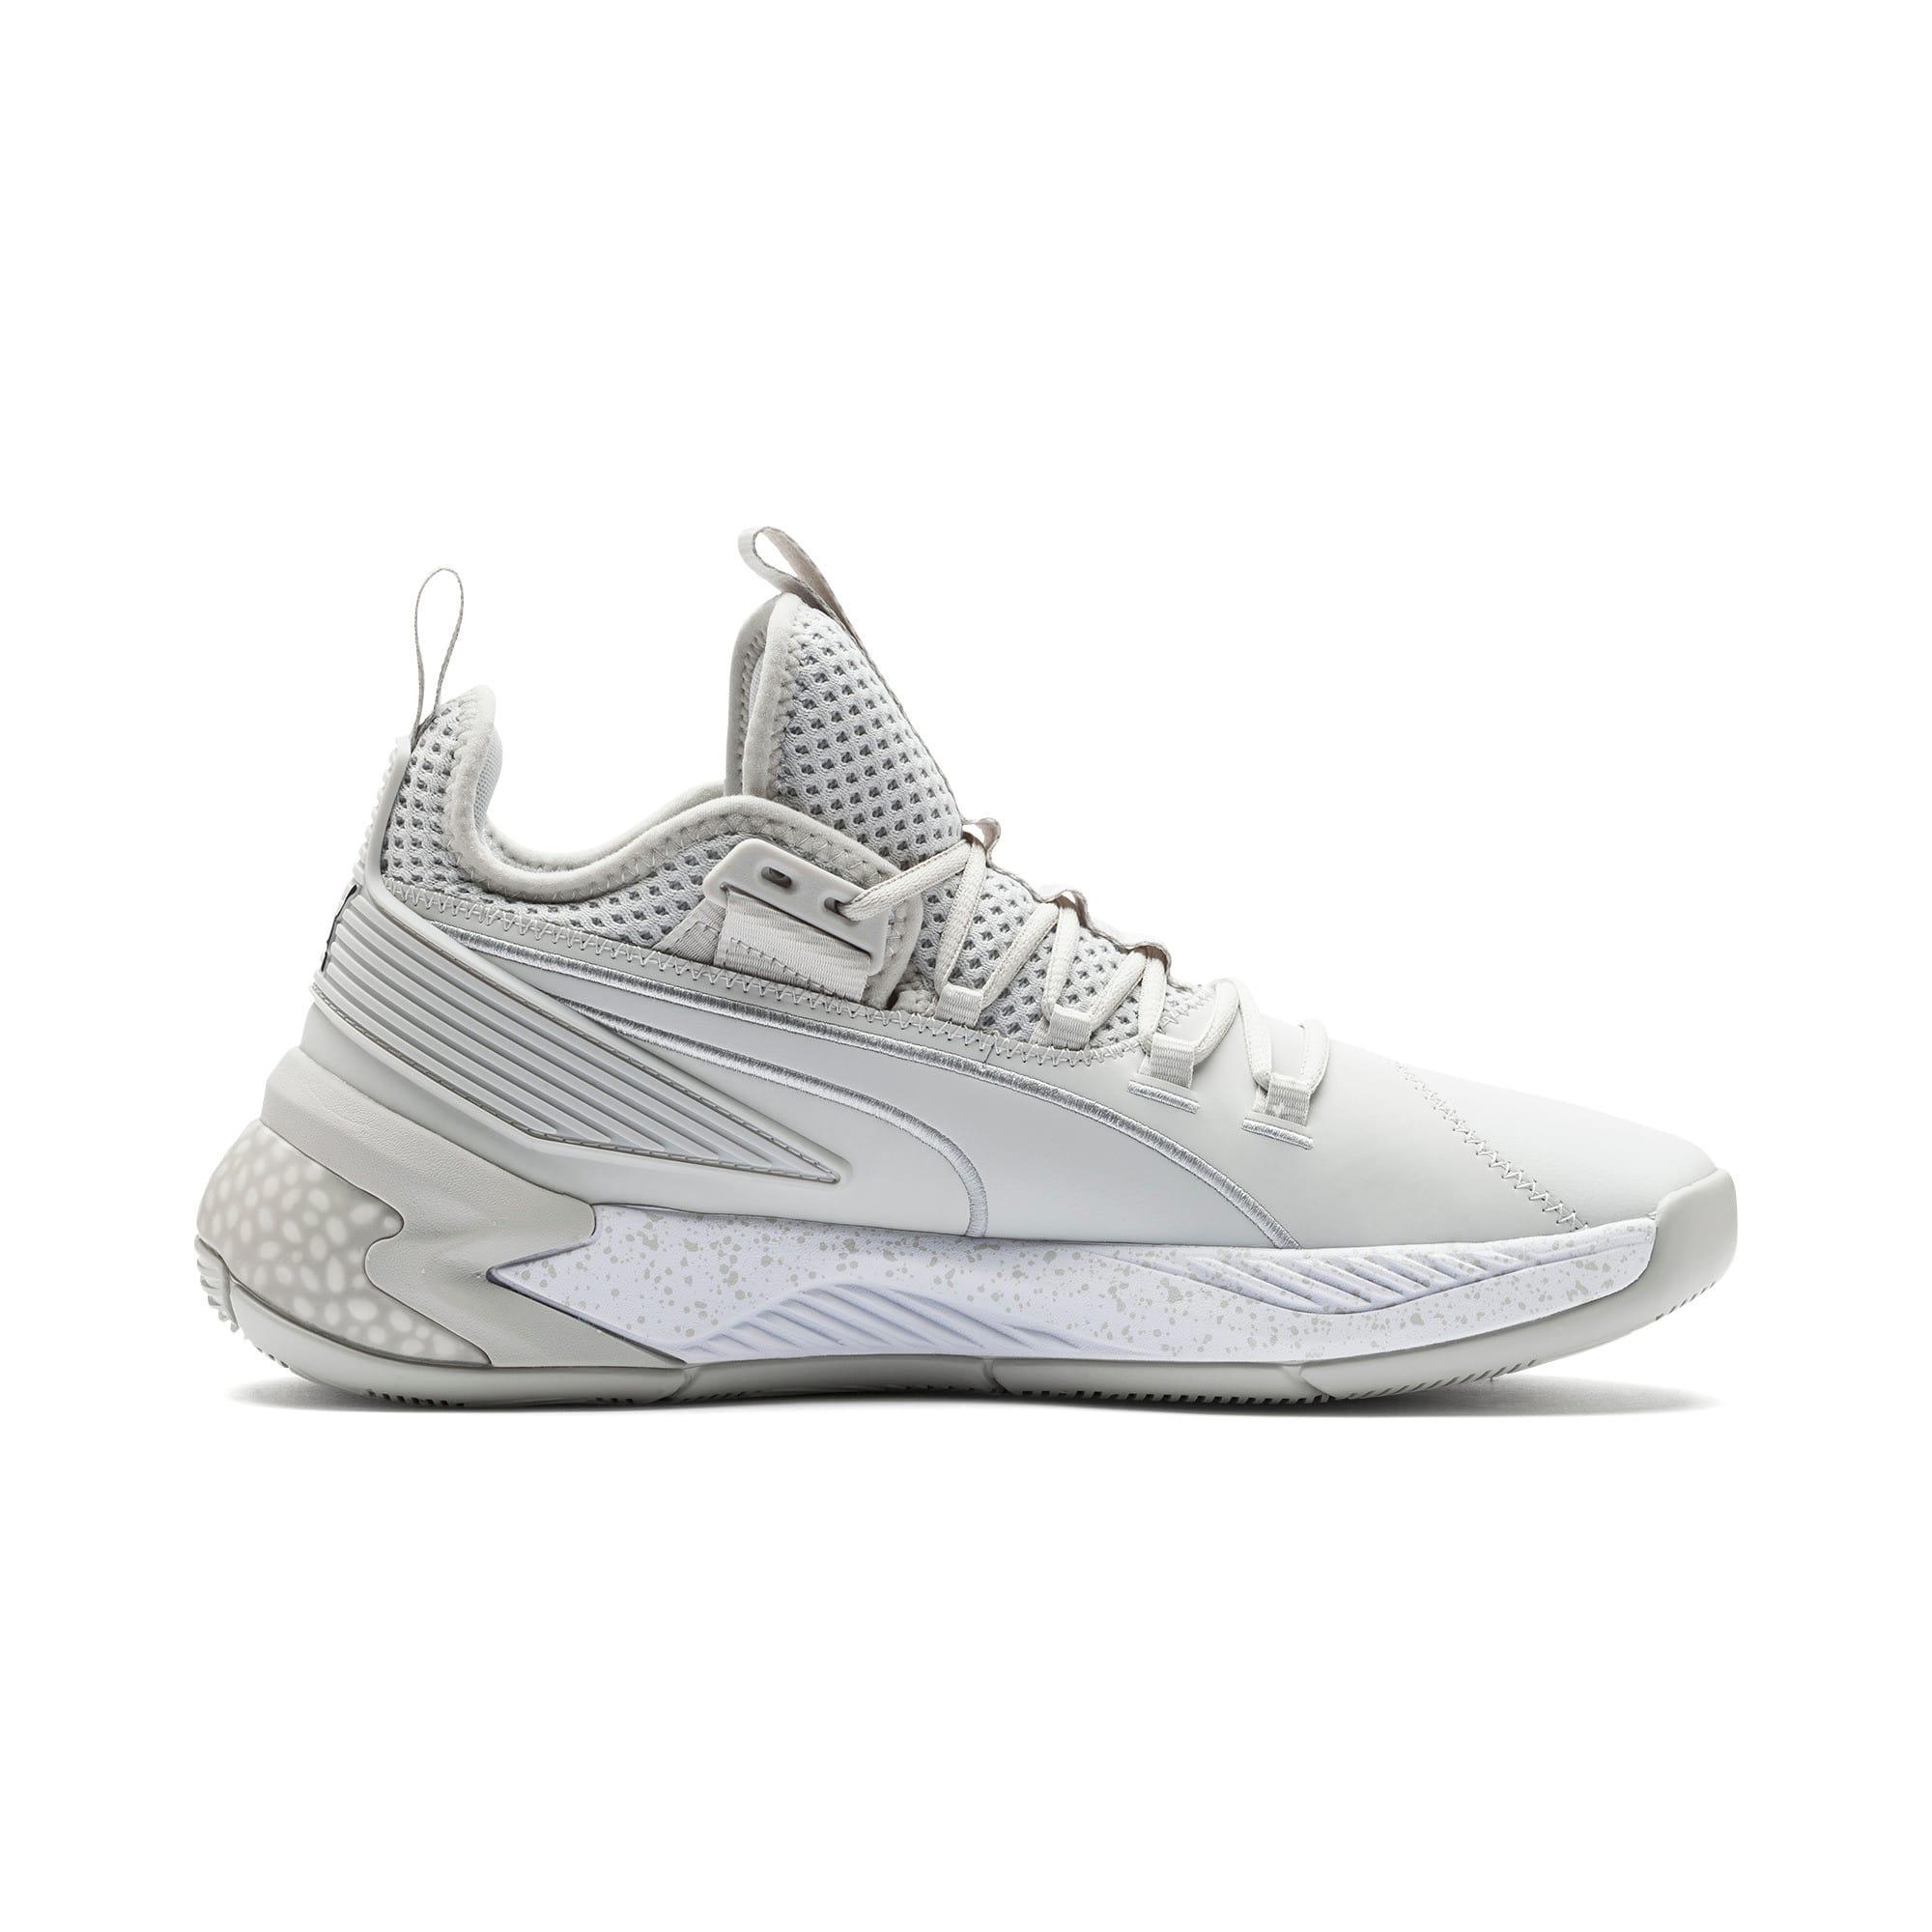 Thumbnail 5 of Uproar Core Basketball Shoes, Glacier Gray, medium